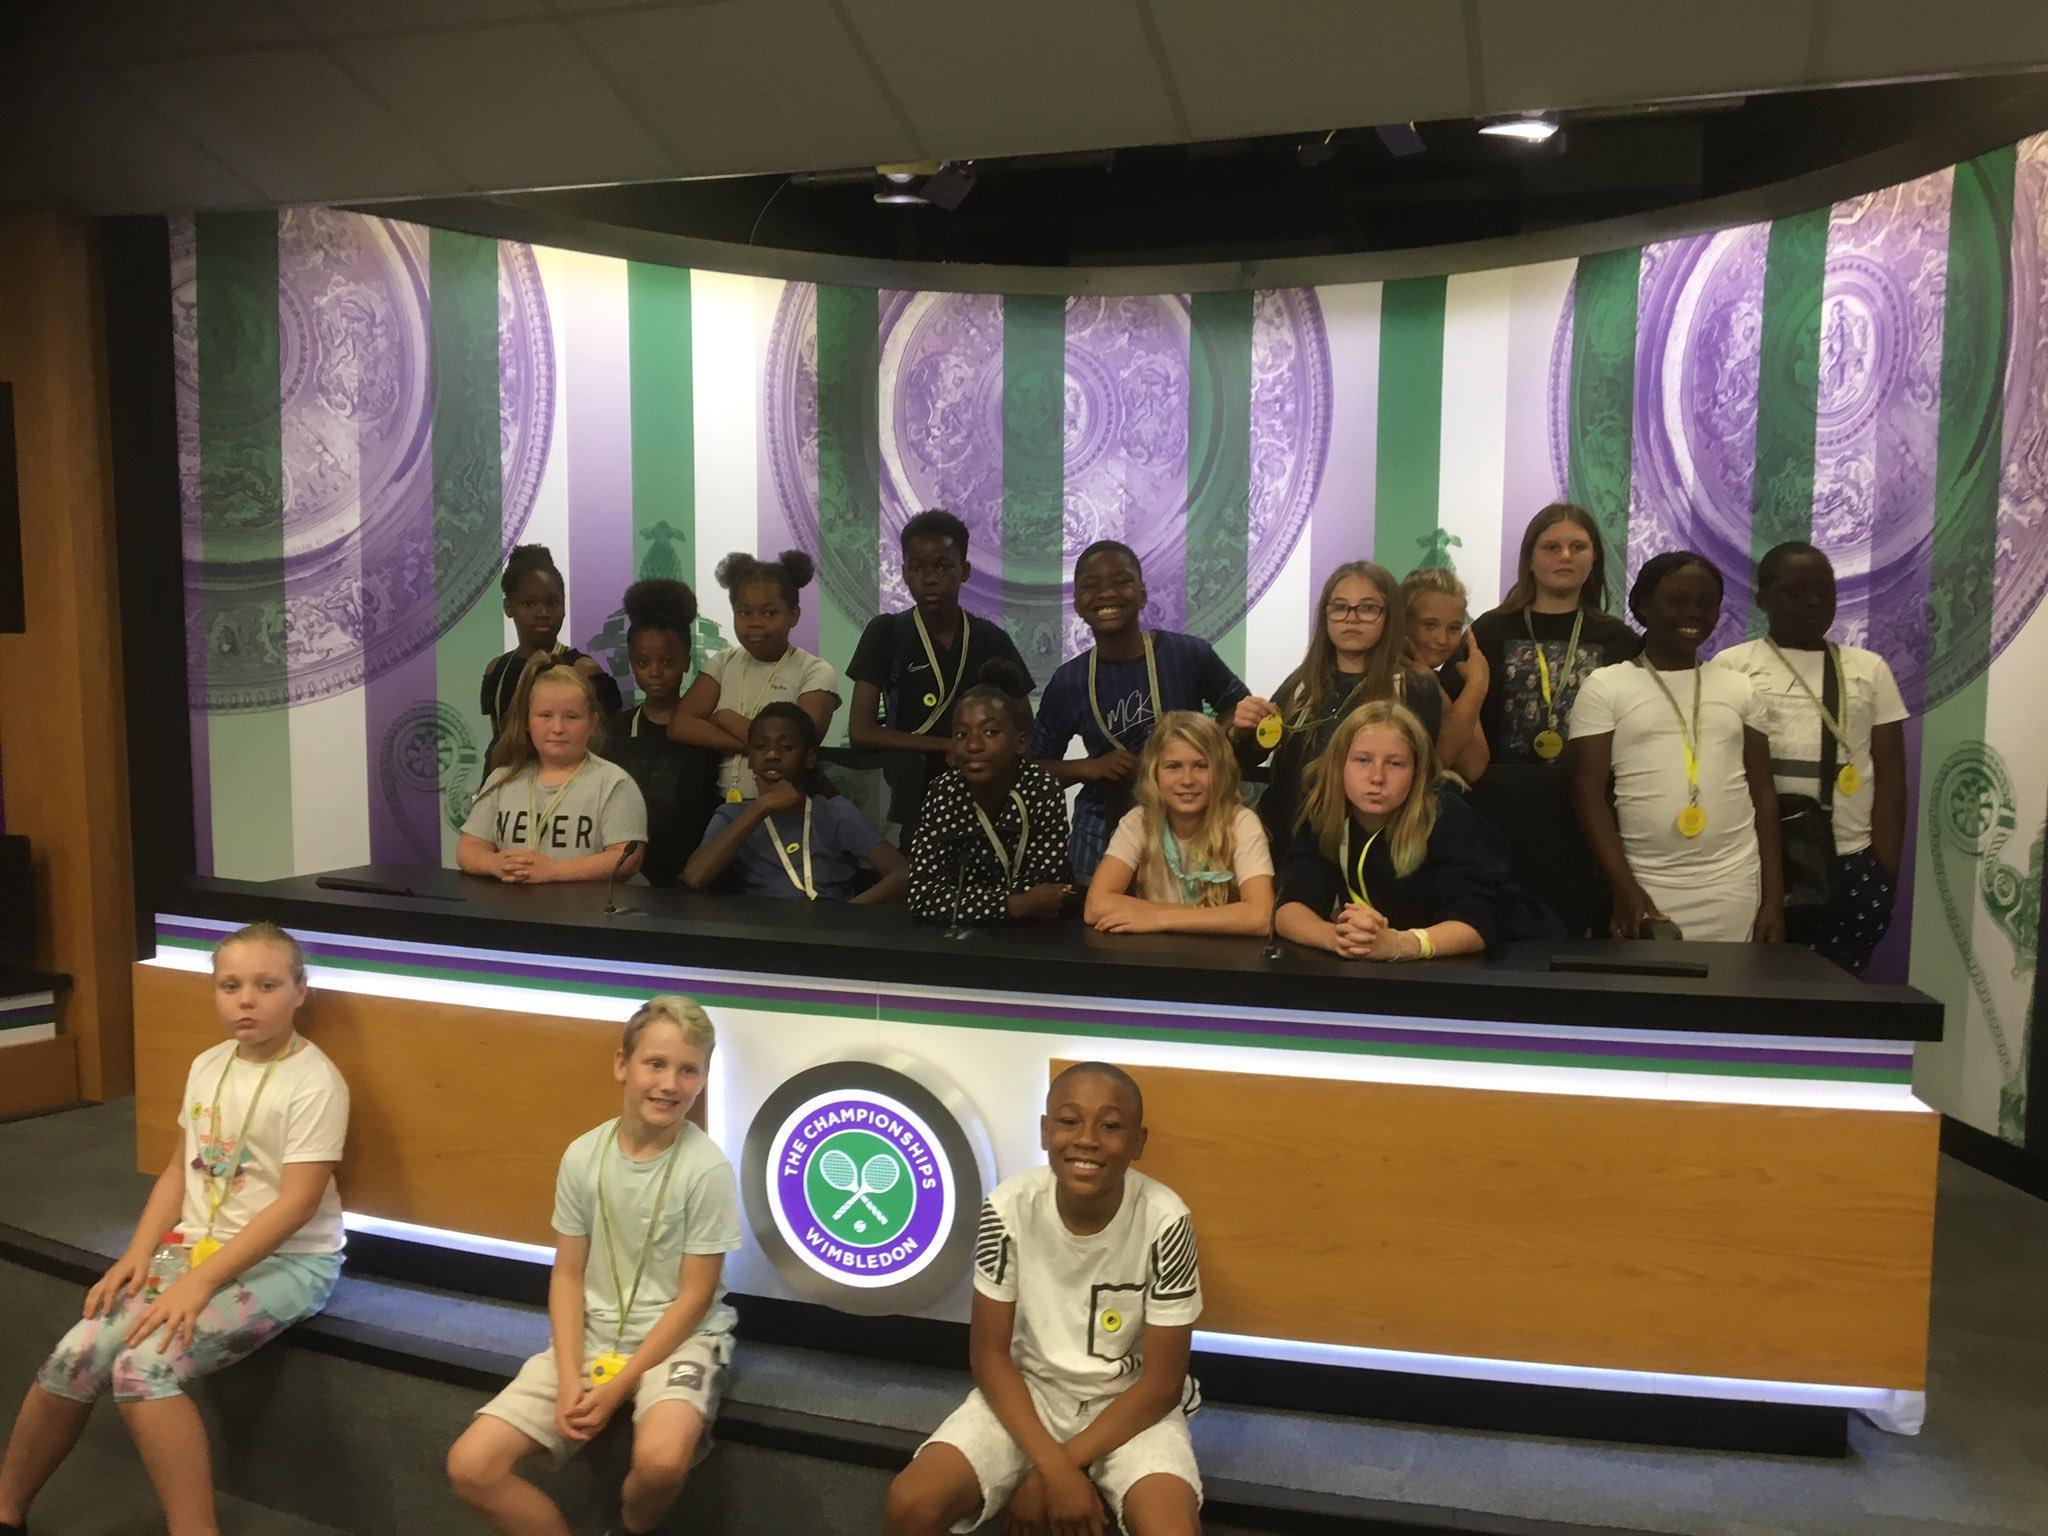 Mitcham kids get taste of tennis thanks to community project